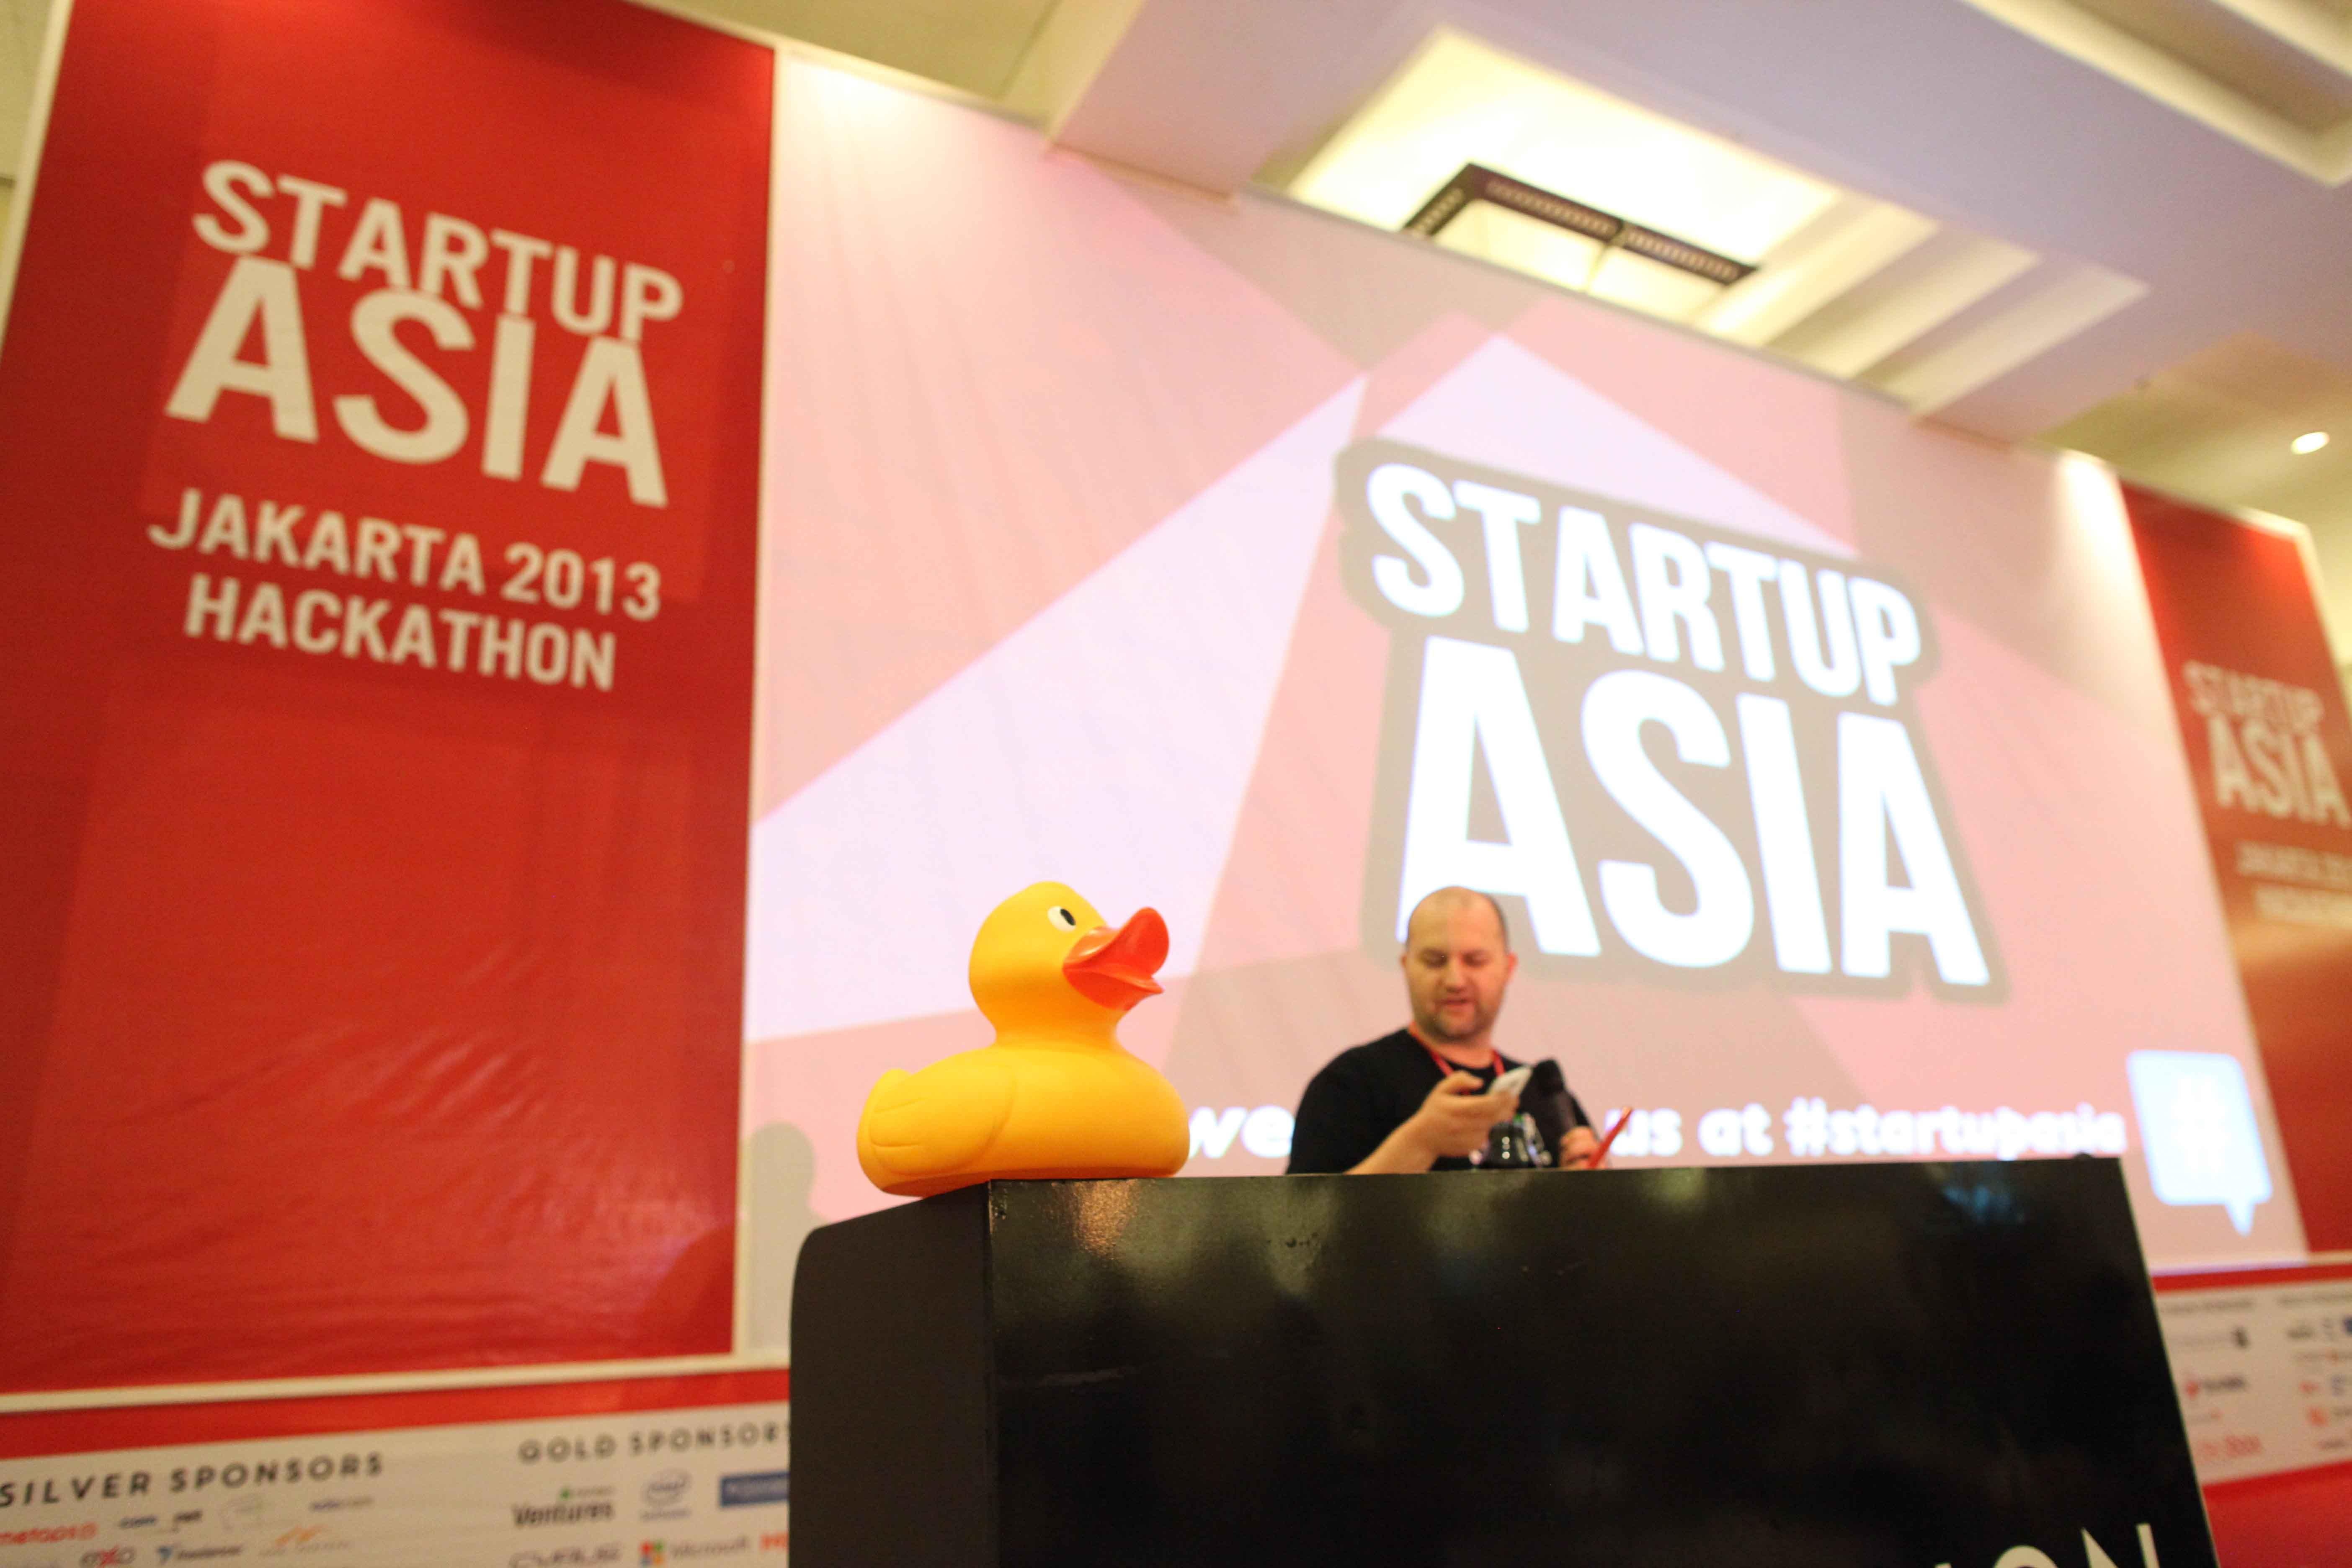 Team DK - Tech in Asia